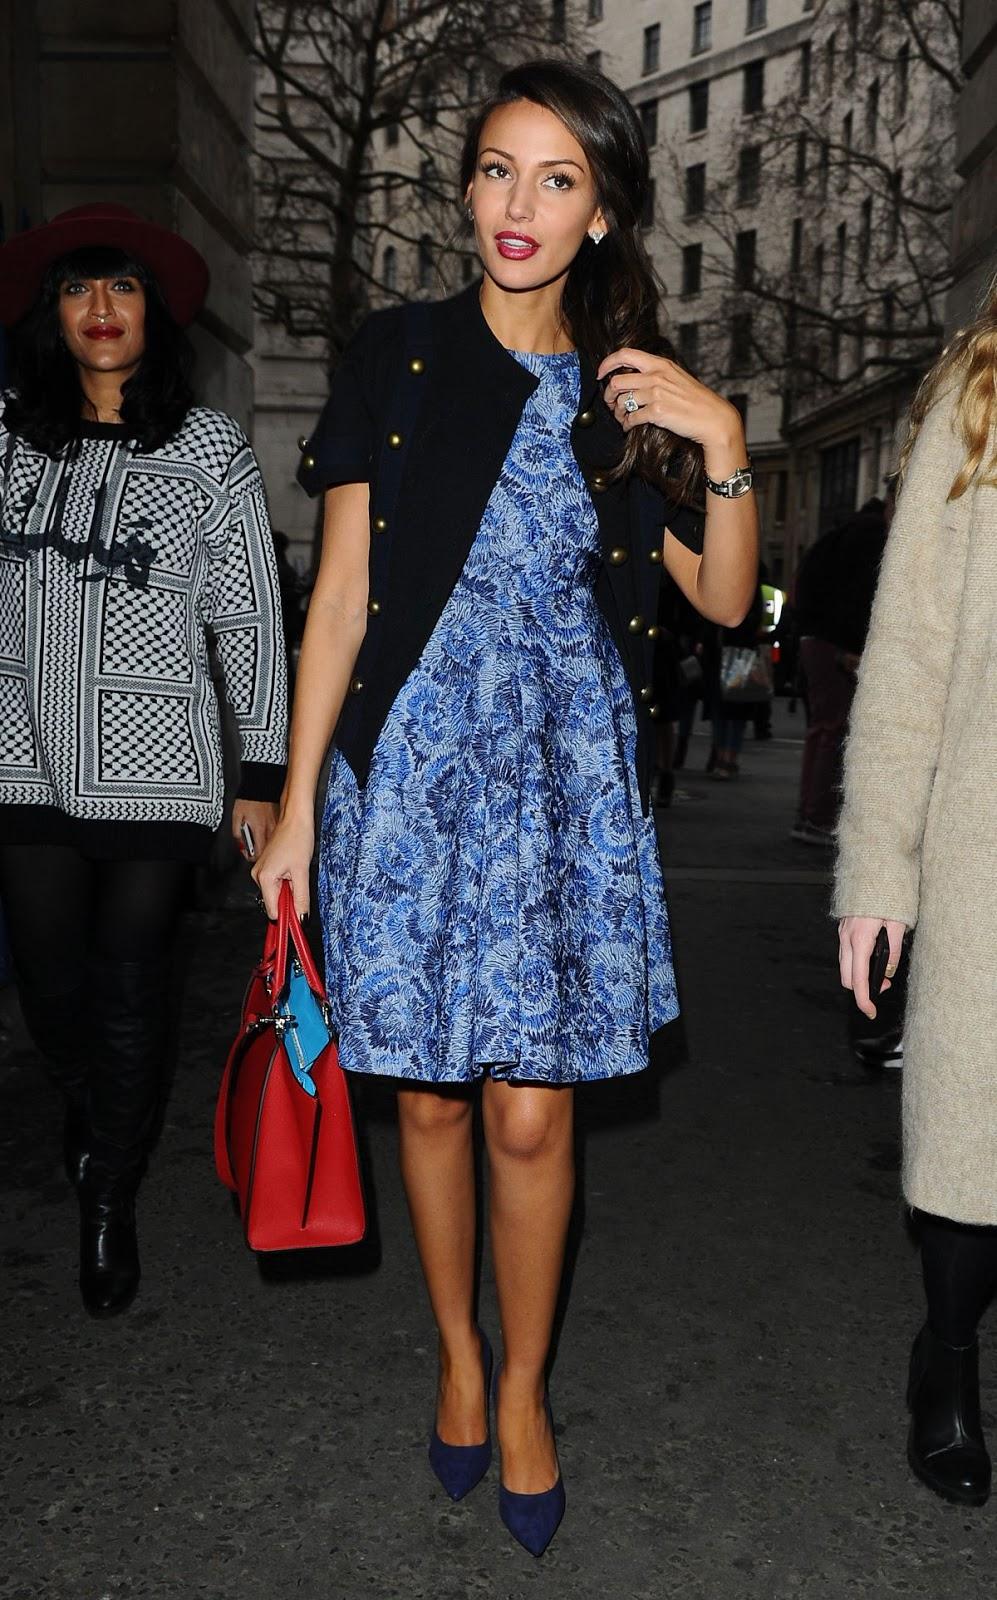 HD Photos of Michelle Keegan At Jean Pierre Braganza Fashion Show In London